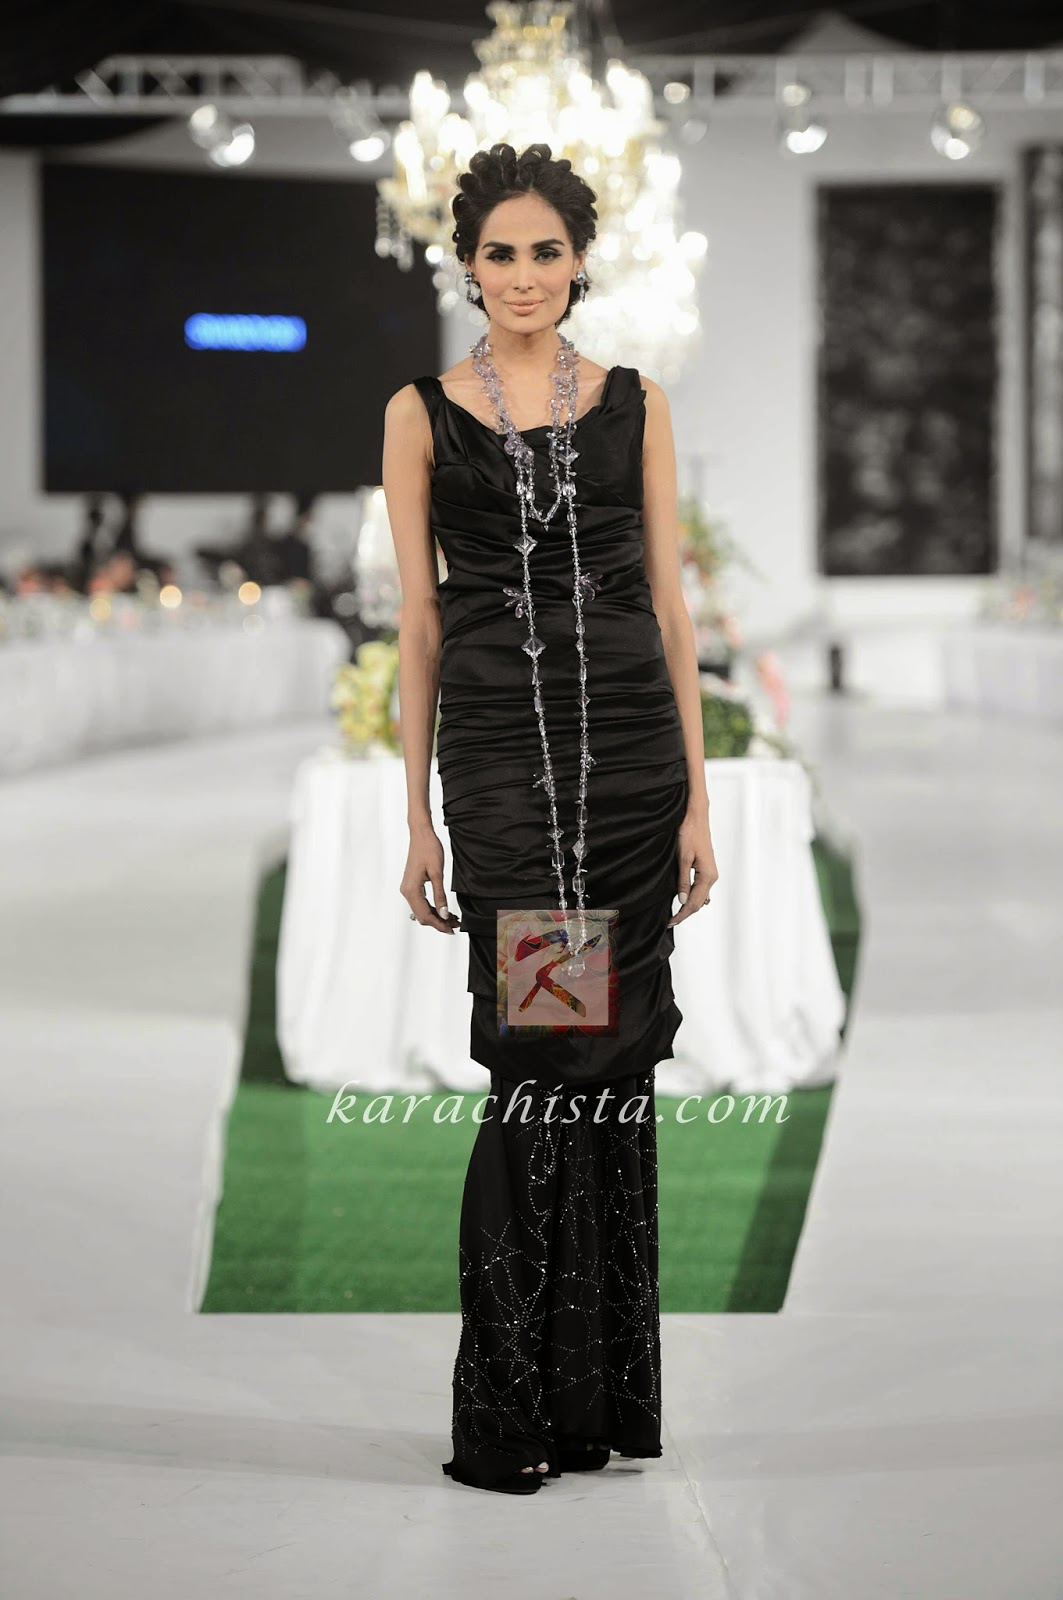 Mehreen Syed in Libas Swarovski crystals ensemble